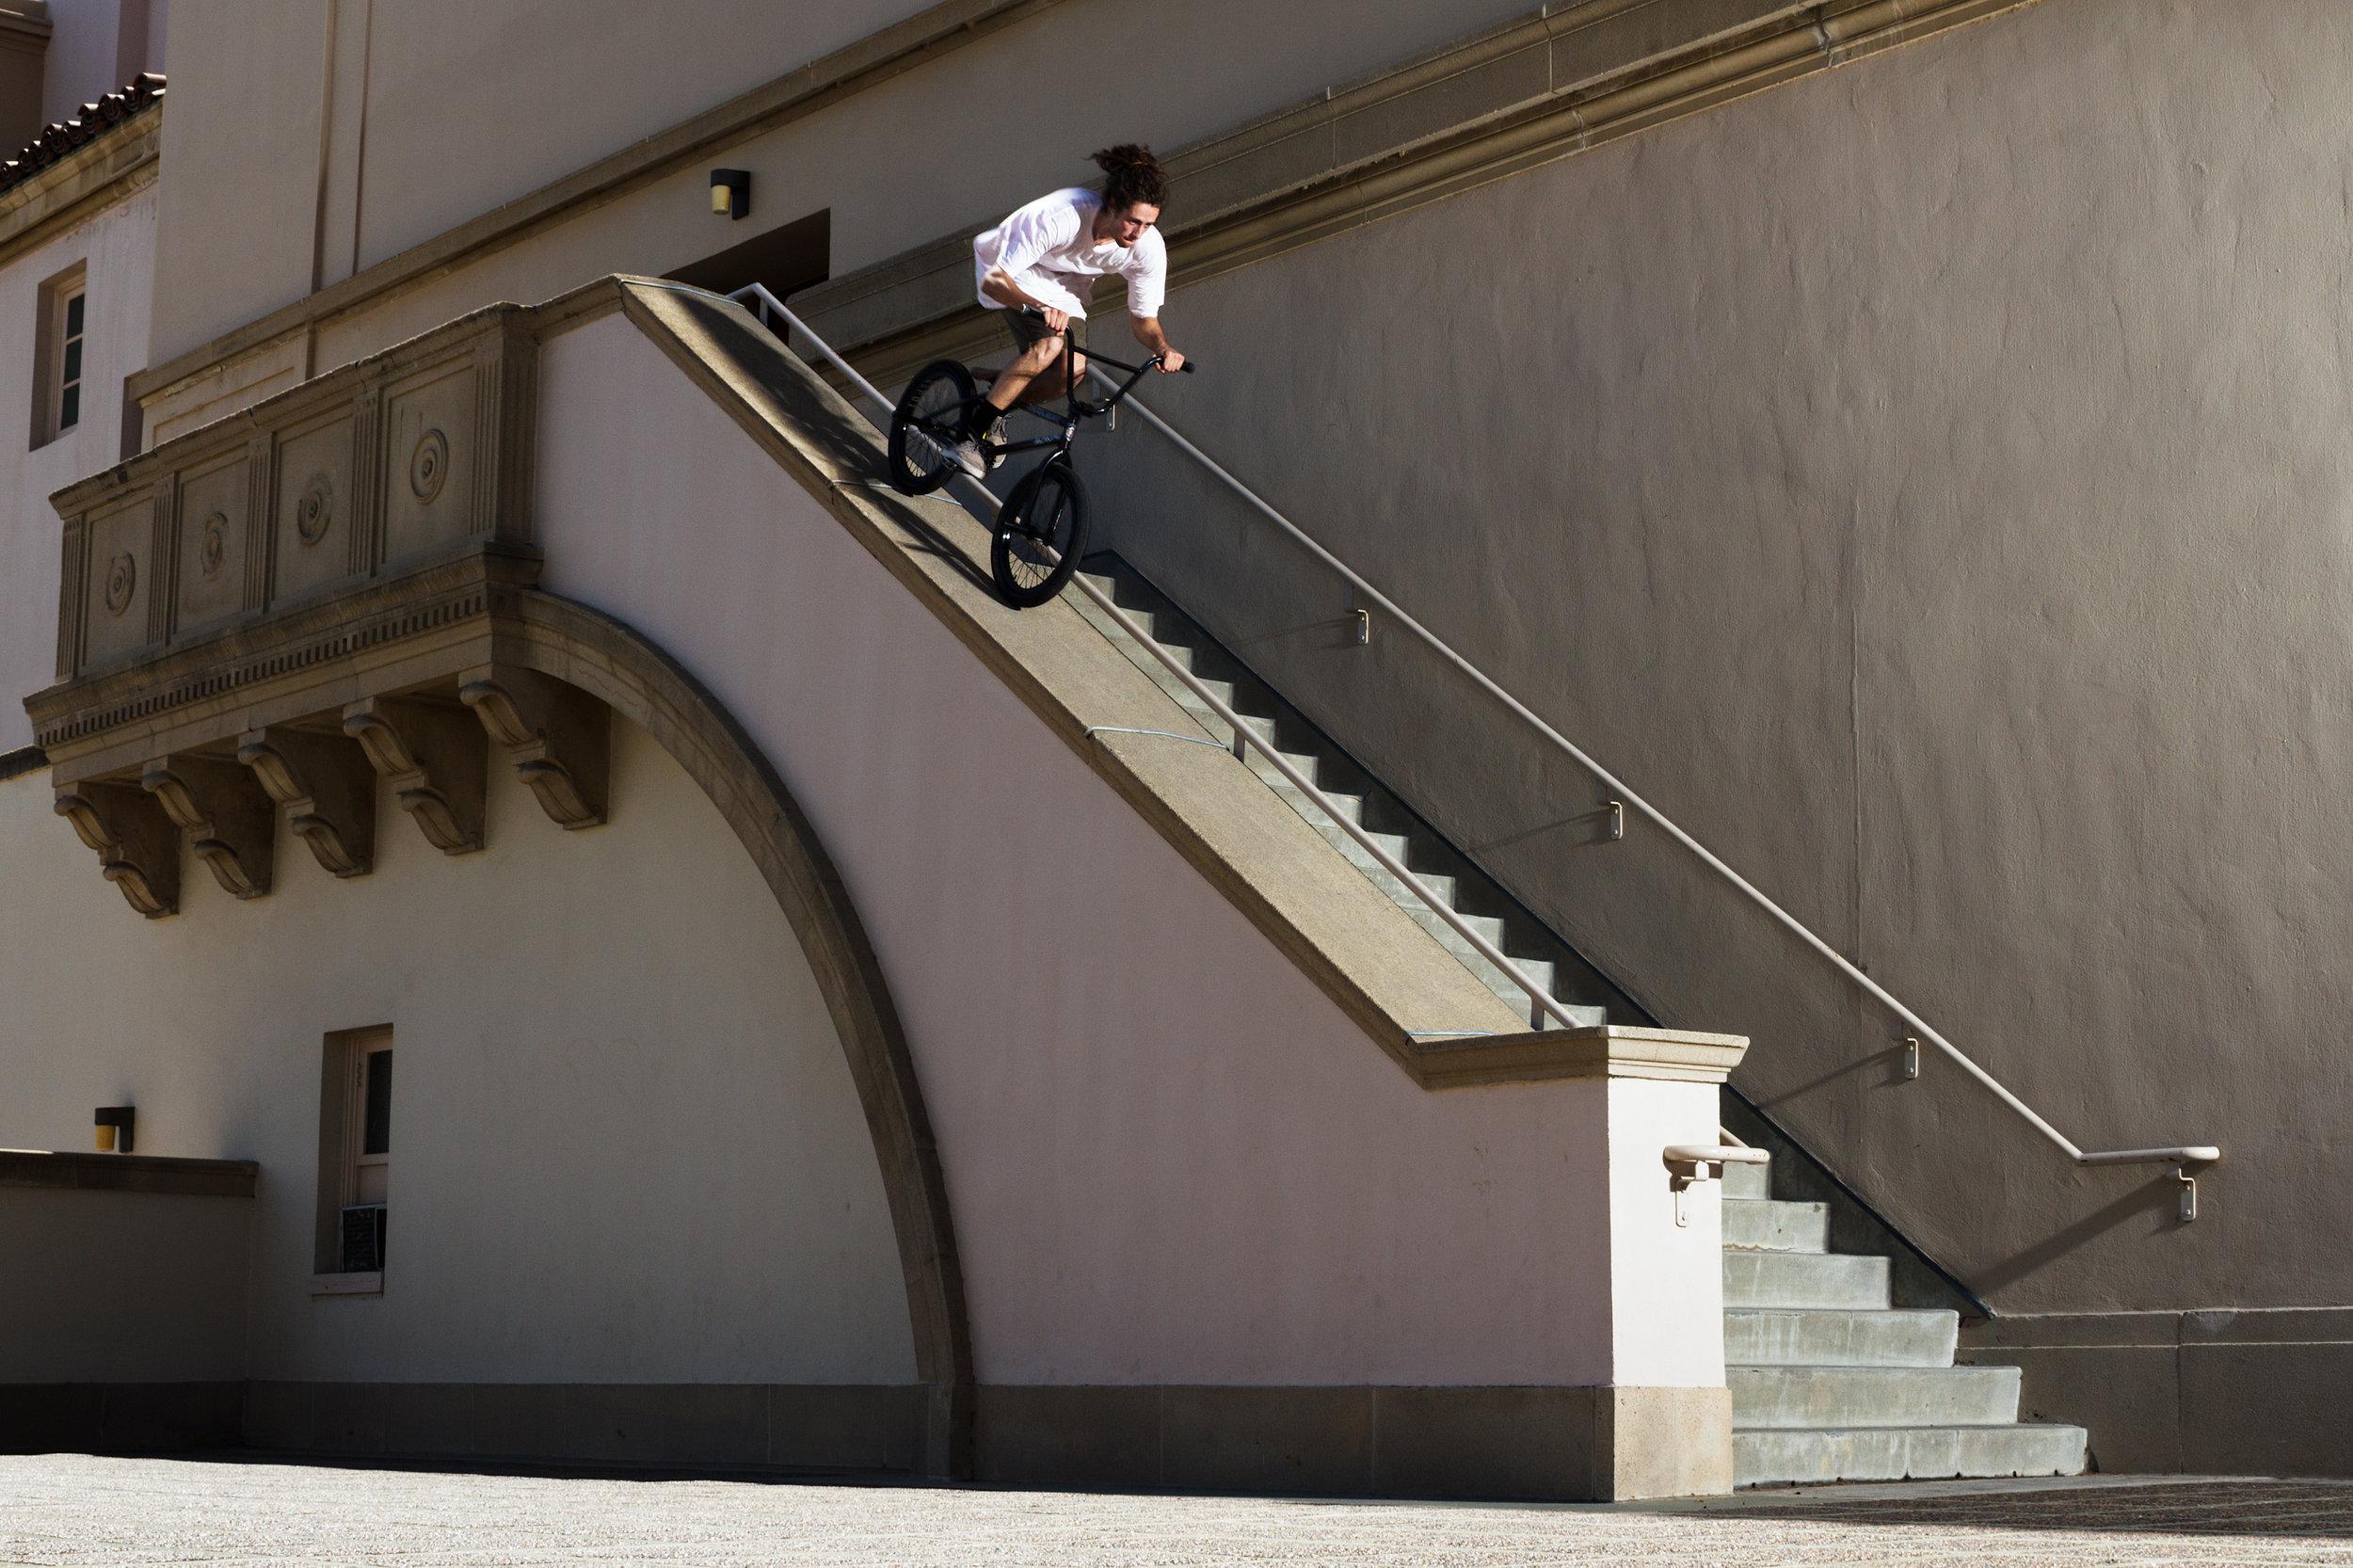 David-Grant-BMX-Pasadena-Devin-Feil.jpg